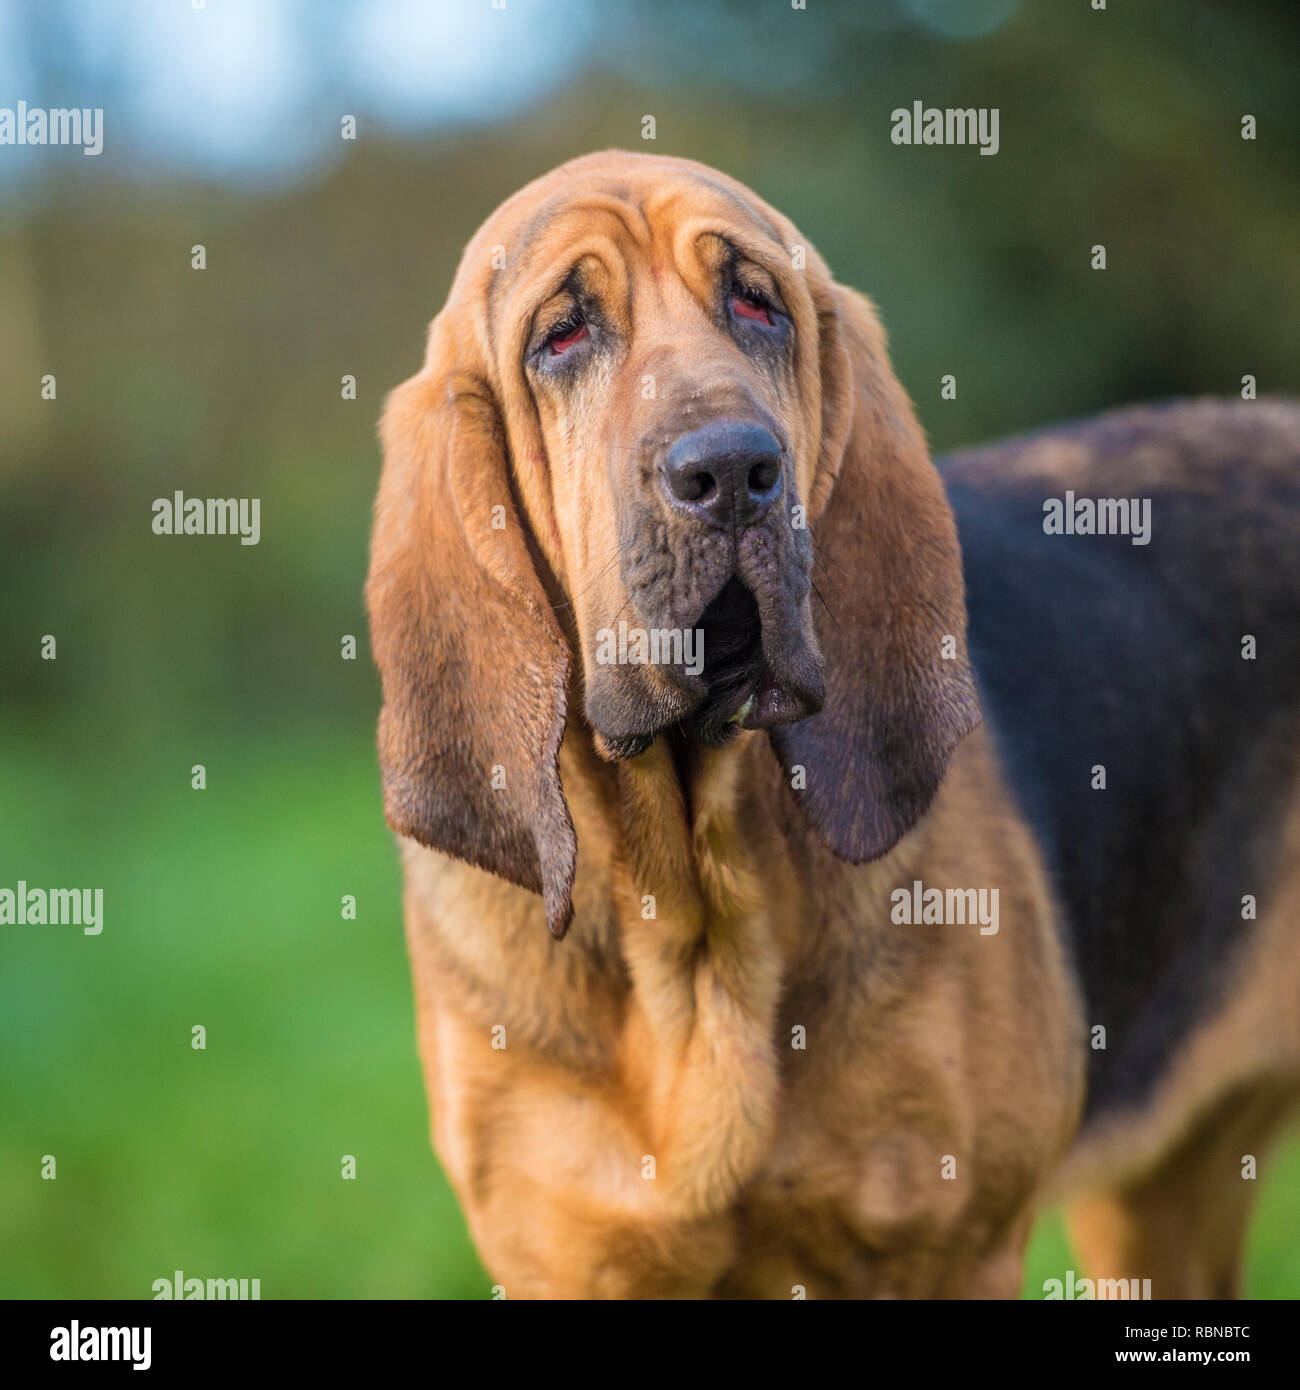 bloodhound - Stock Image